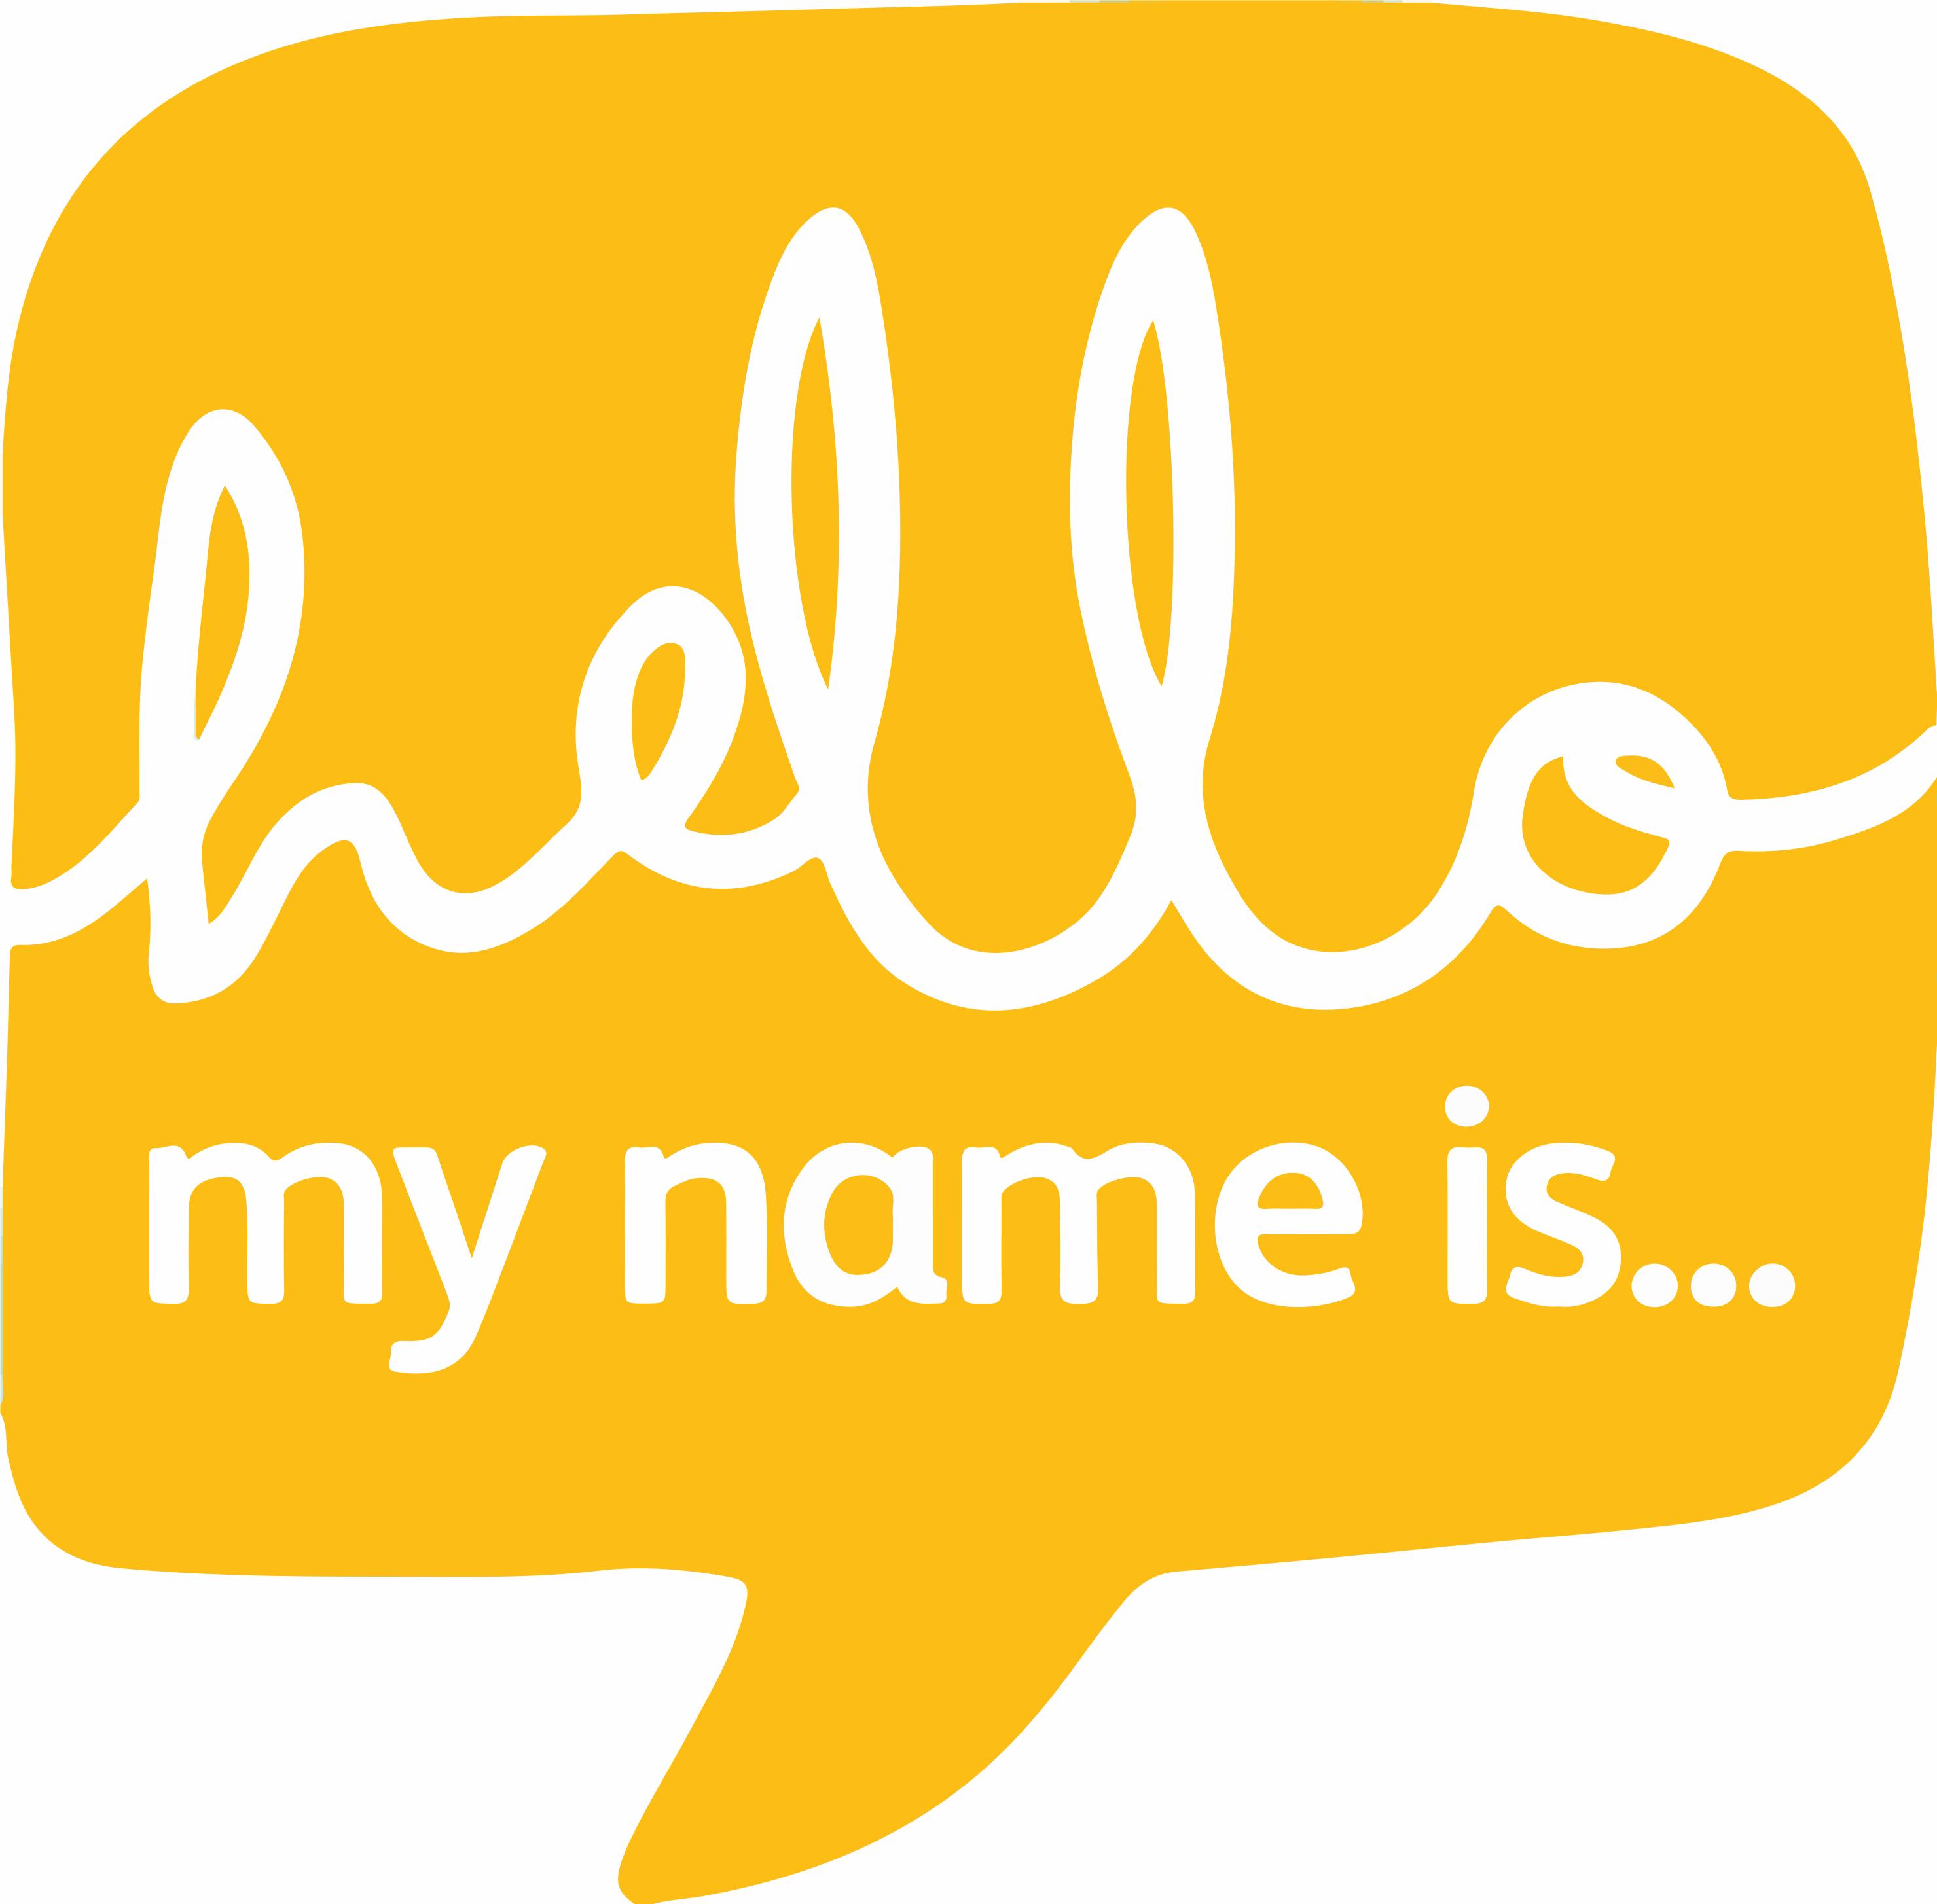 Name logo clipart clip transparent stock Free My Name Cliparts, Download Free Clip Art, Free Clip Art on ... clip transparent stock